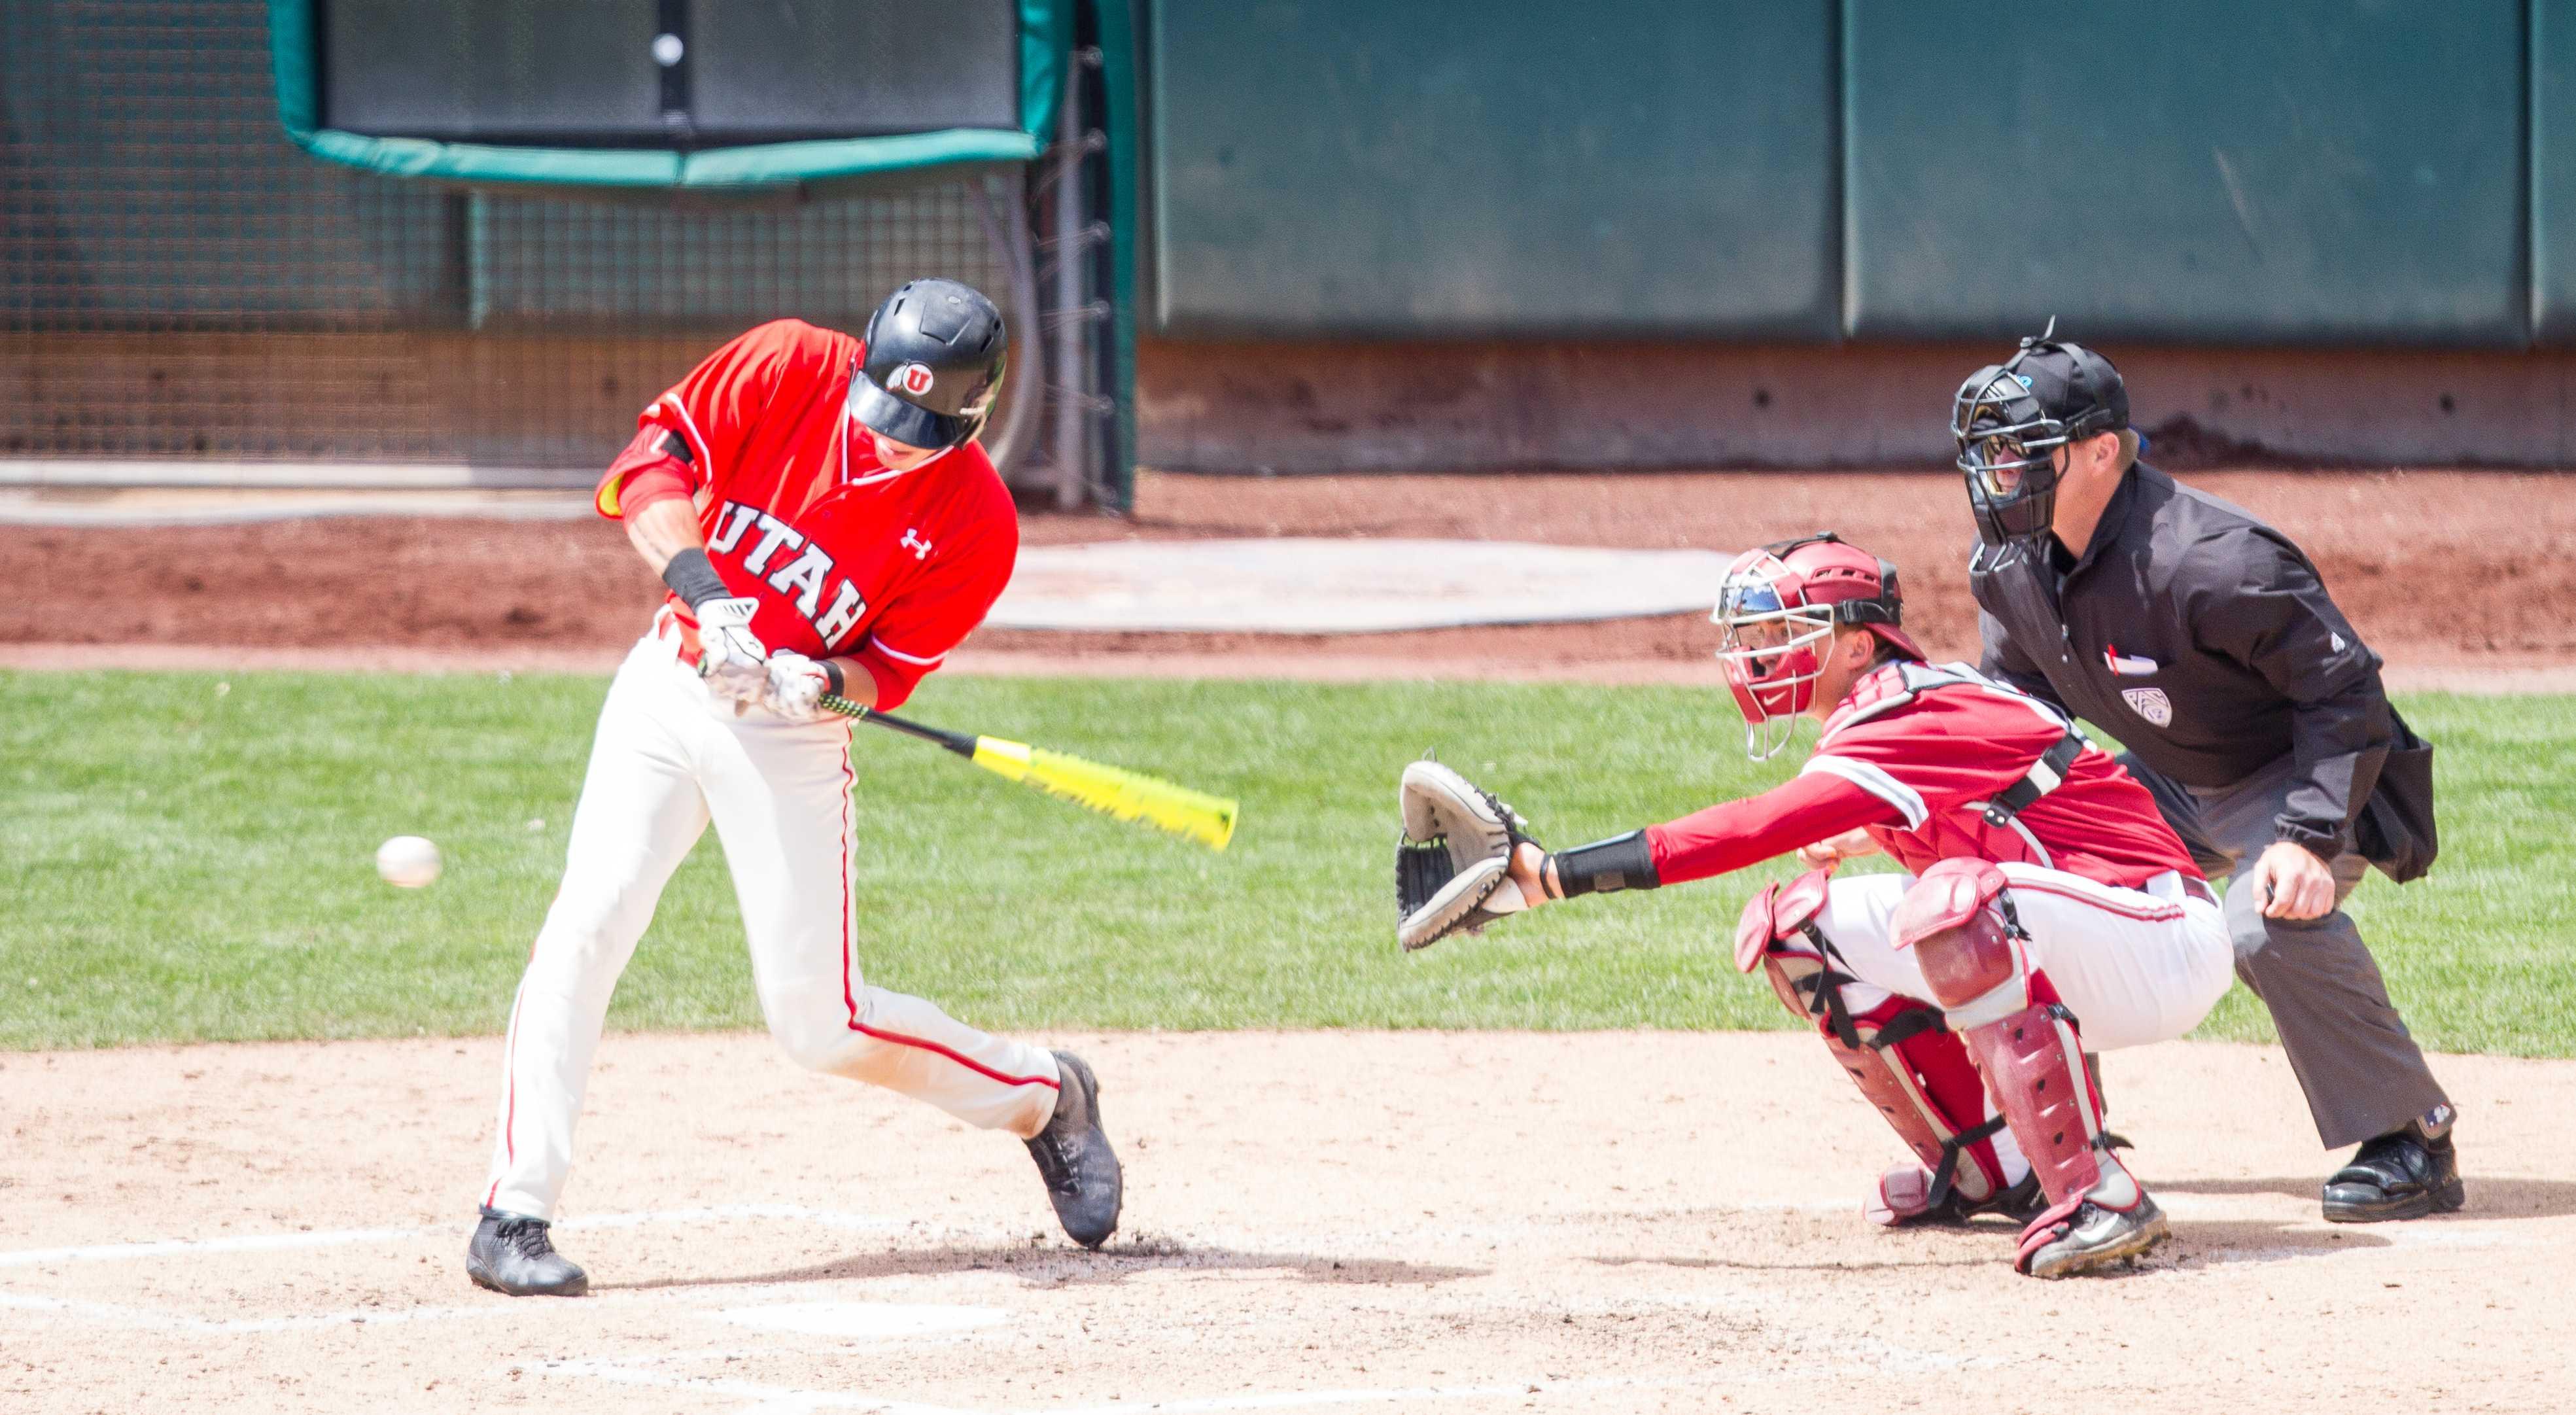 Sophmore Dashawn Keisey Jr. (21) during the University of Utah Baseball game against Washington State at Smith's Ballpark, Salt Lake City, UT, 4/29/17.  Photo by Adam Fondren/Daily Utah Chronicle